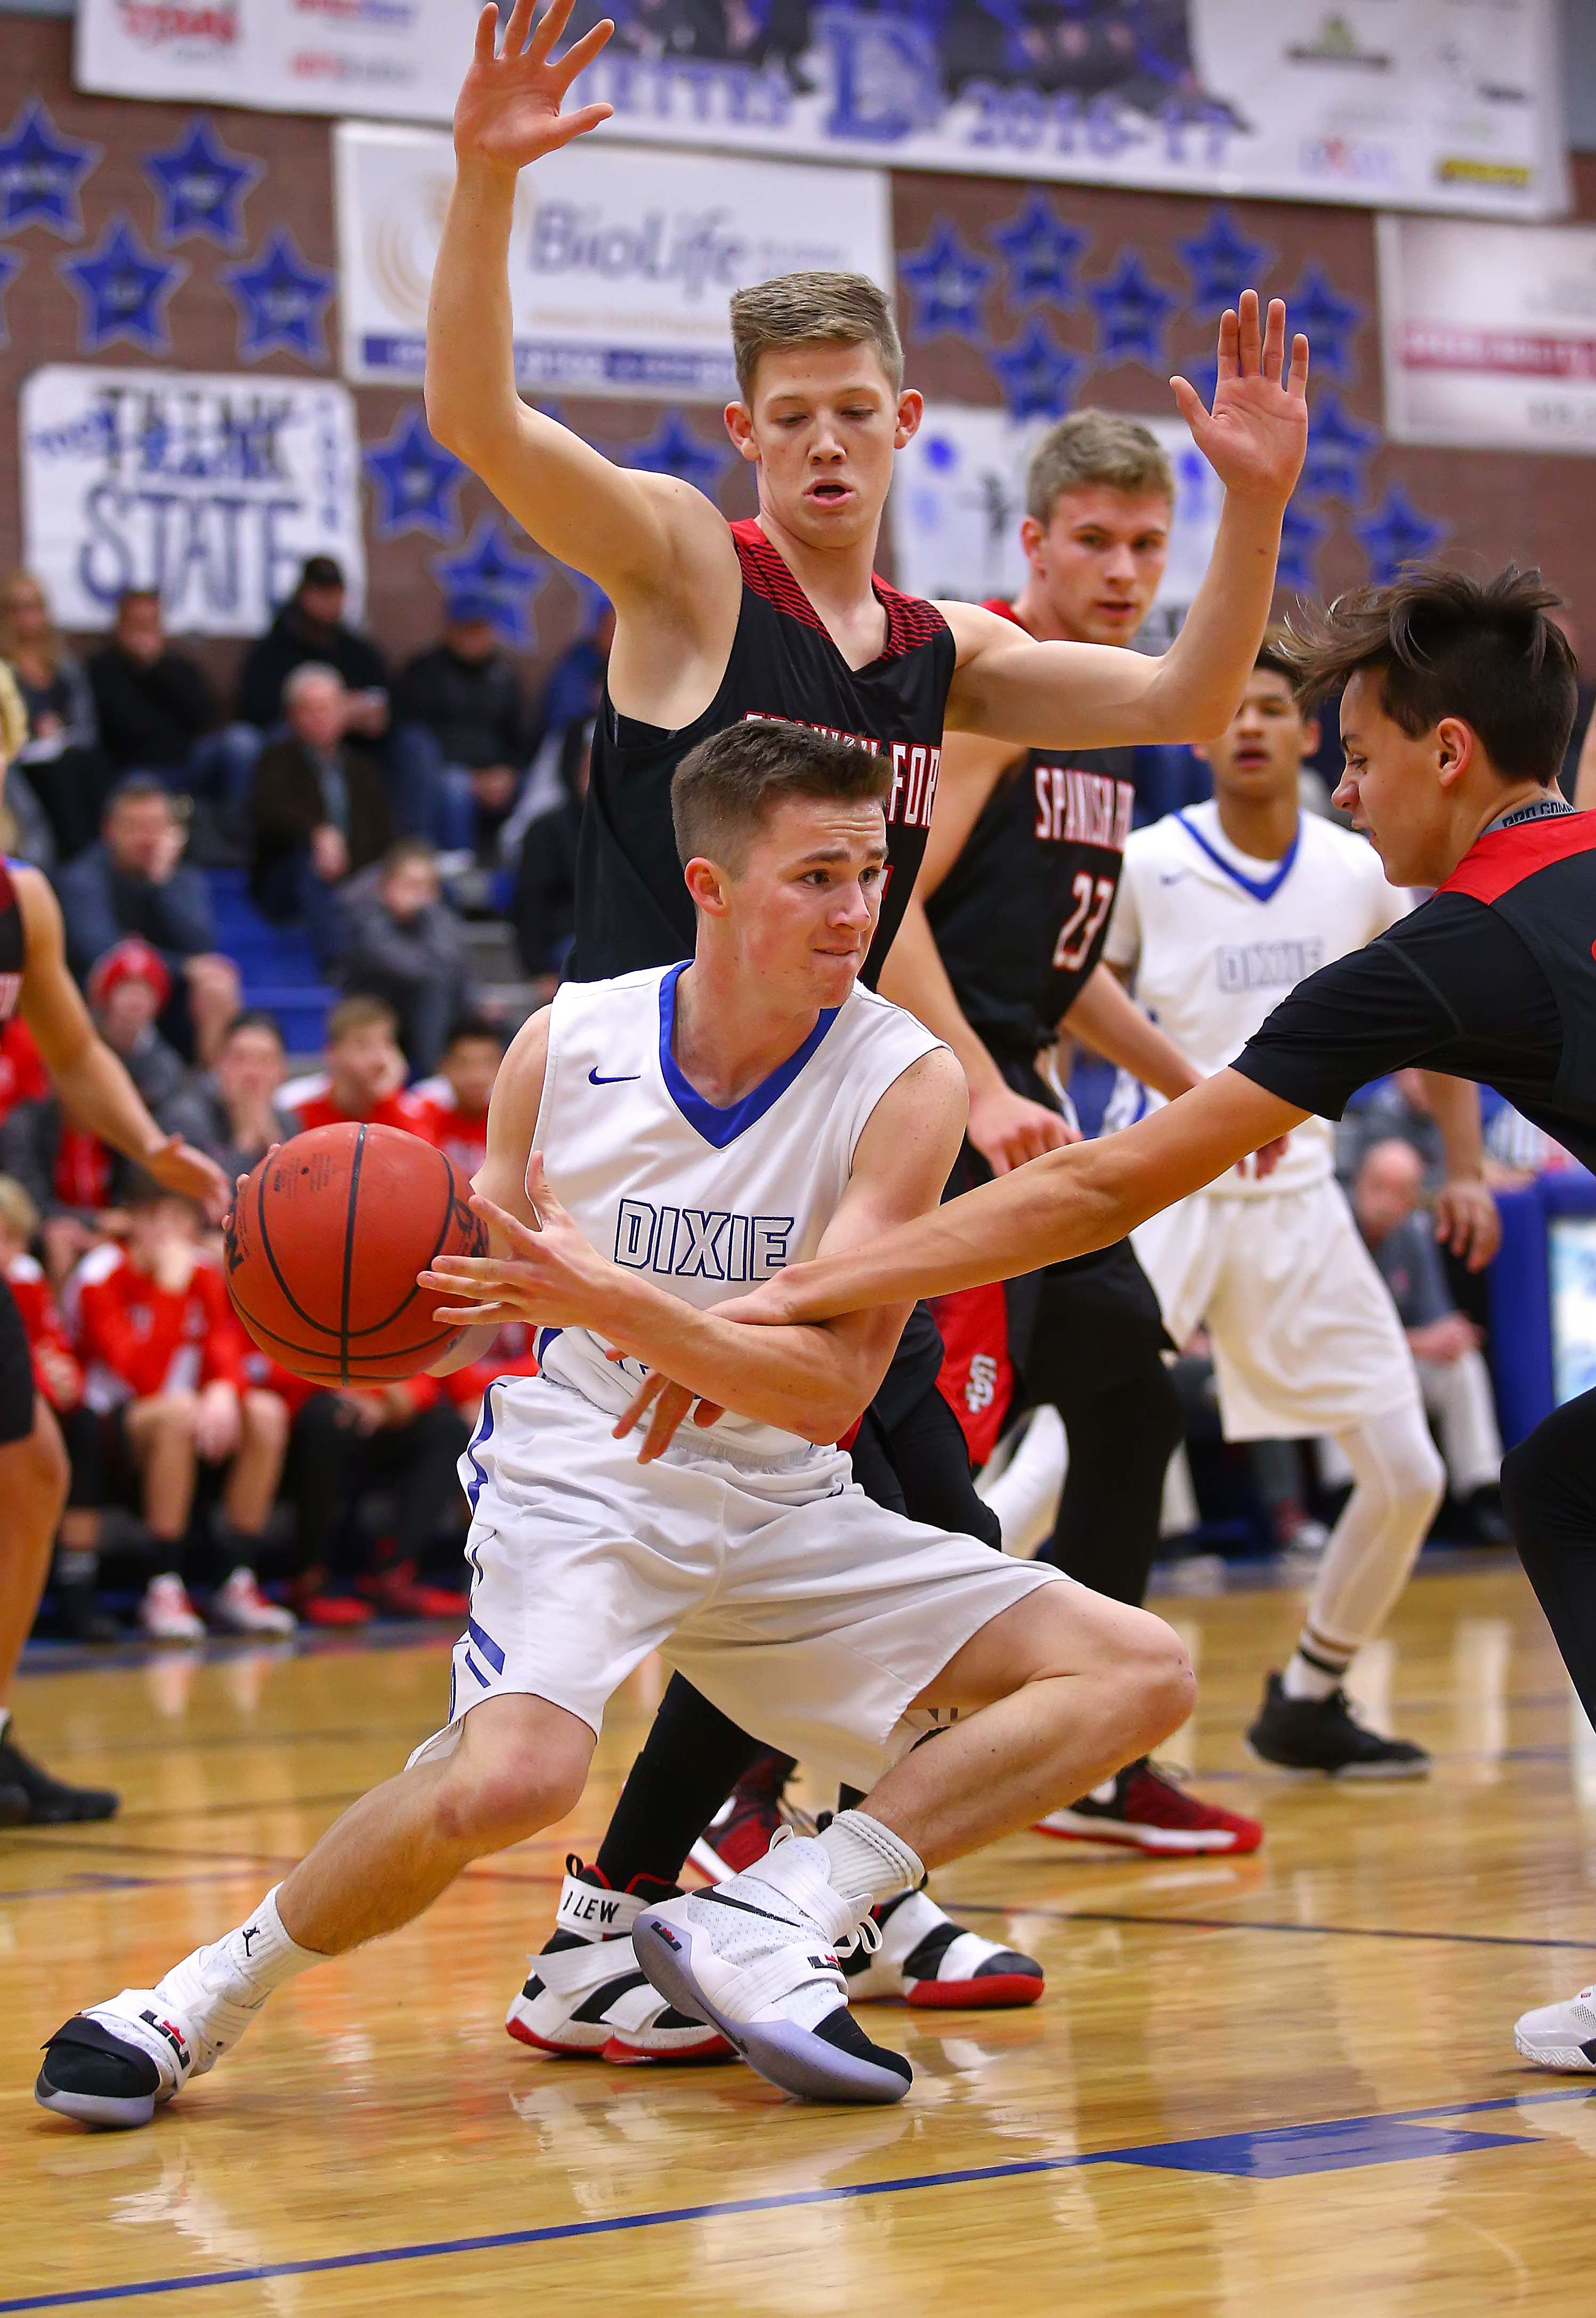 Dixie's Sam Stewart (24), Dixie vs. Spanish Fork, Boys Basketball, St. George, Utah, Dec. 9, 2016, | Photo by Robert Hoppie, ASPpix.com, St. George News